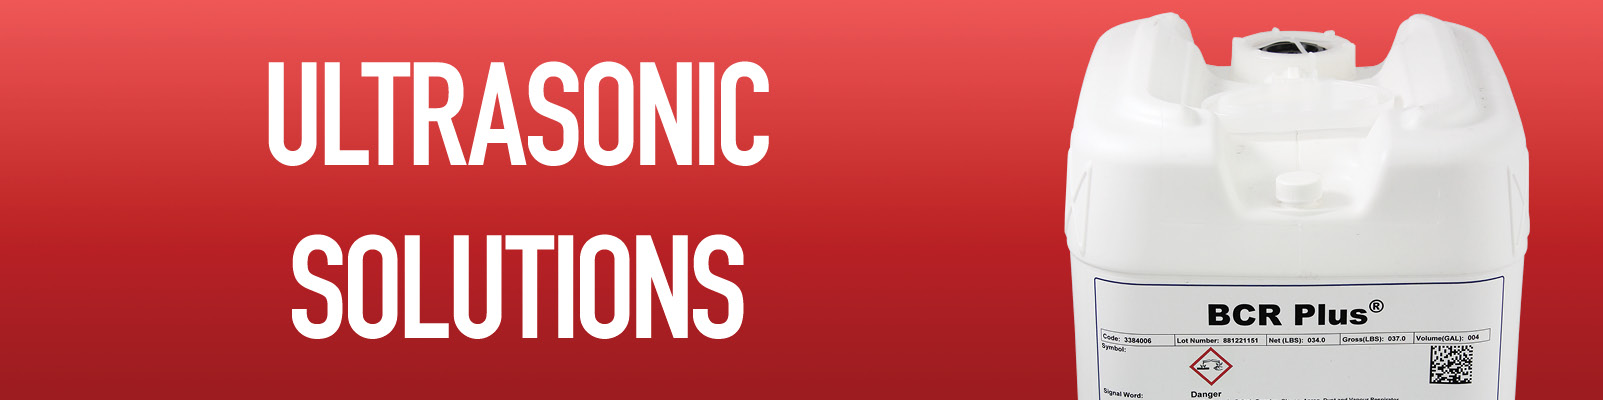 Ultrasonic Solutions